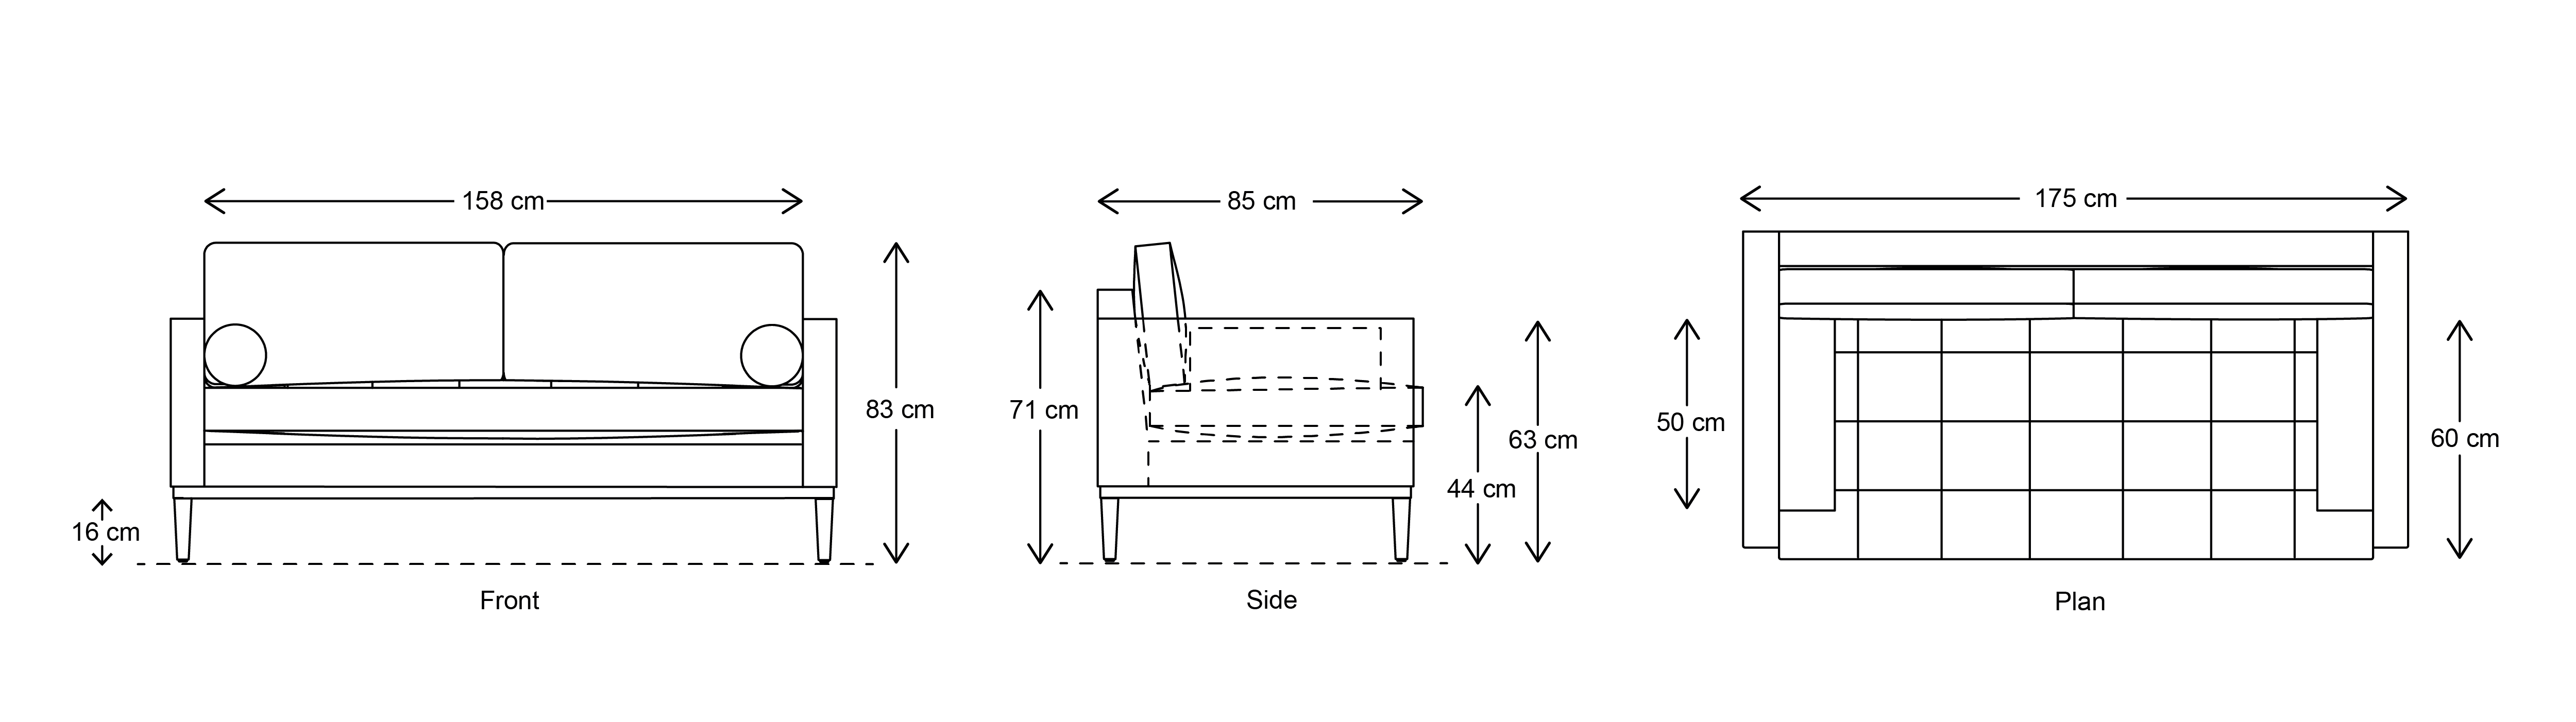 Model 02 2 Seater Sofa Dimensions Drawing